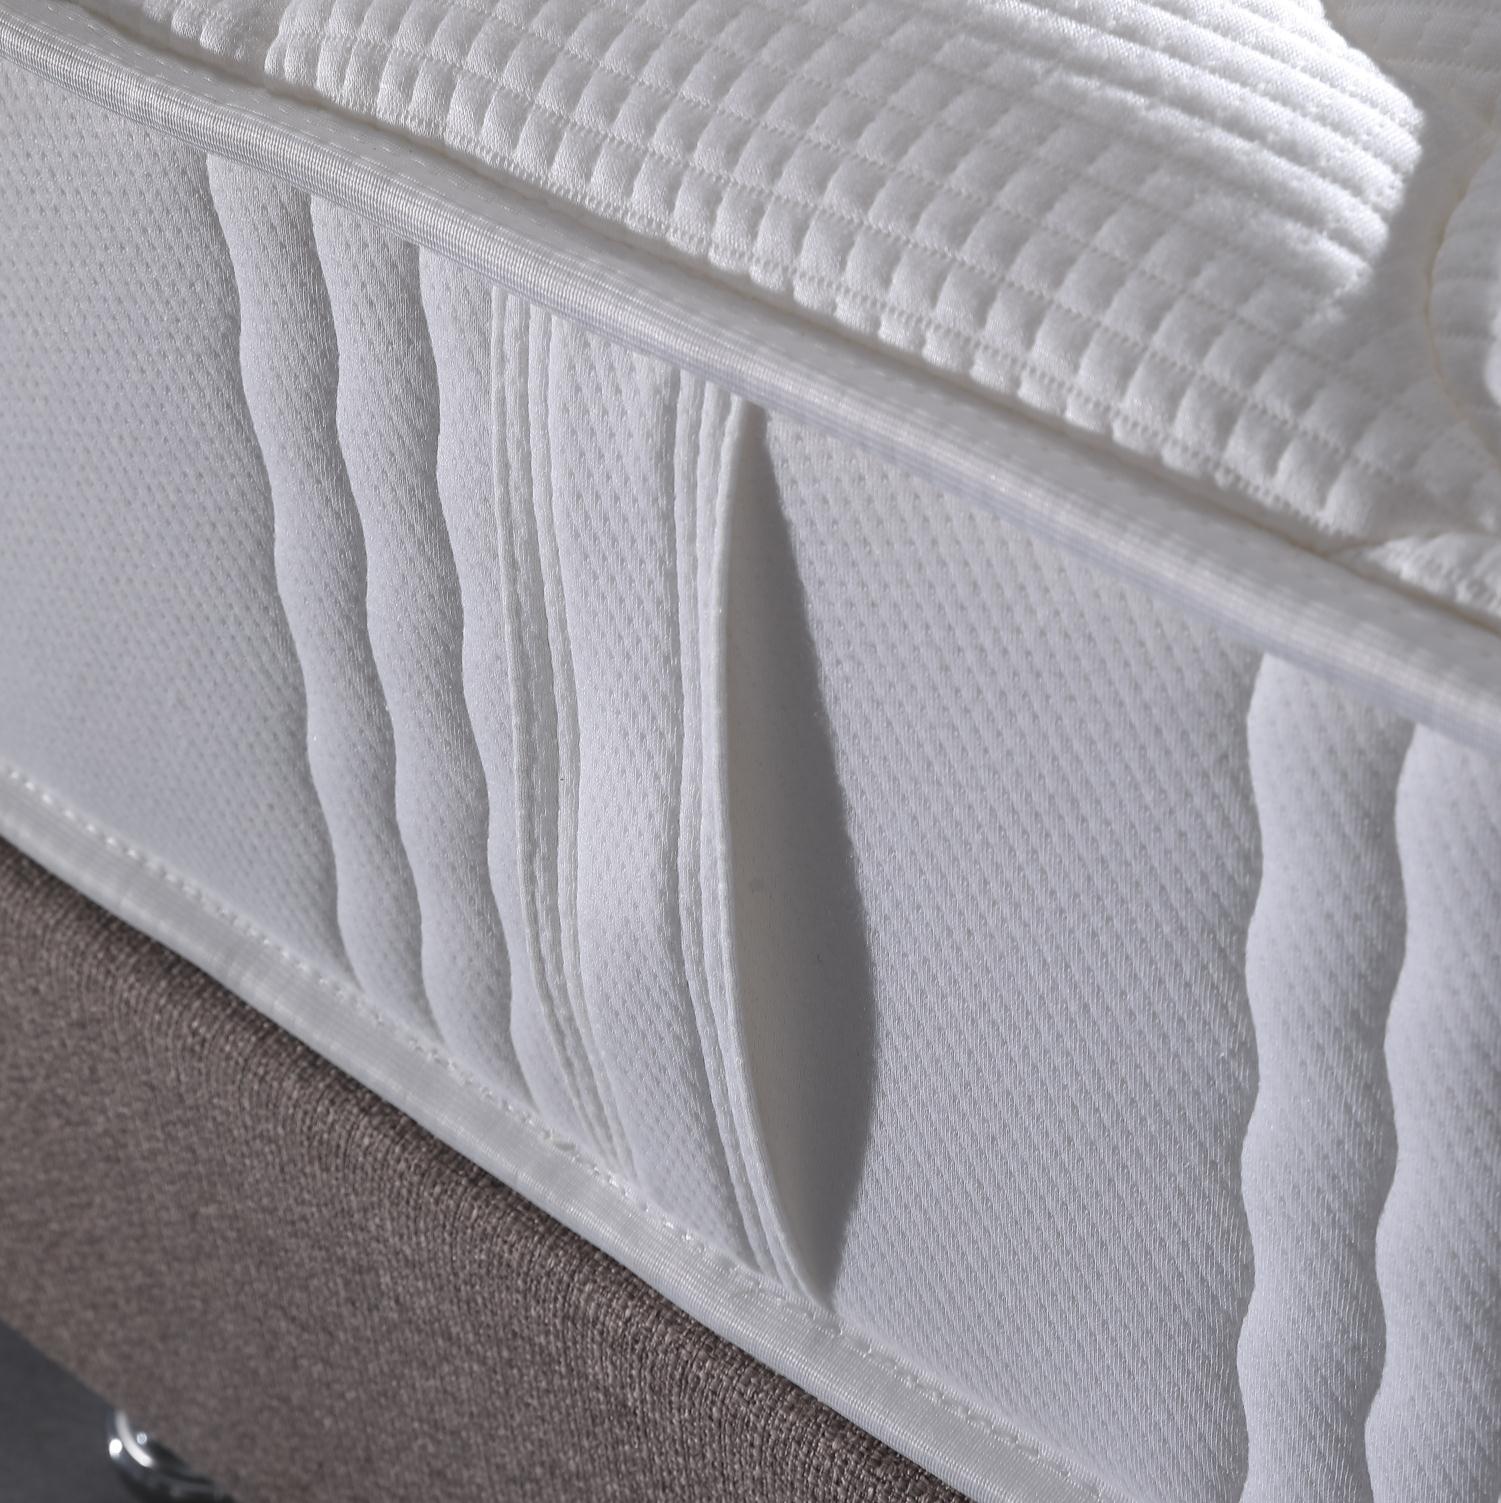 mattress world using price for tavern-1